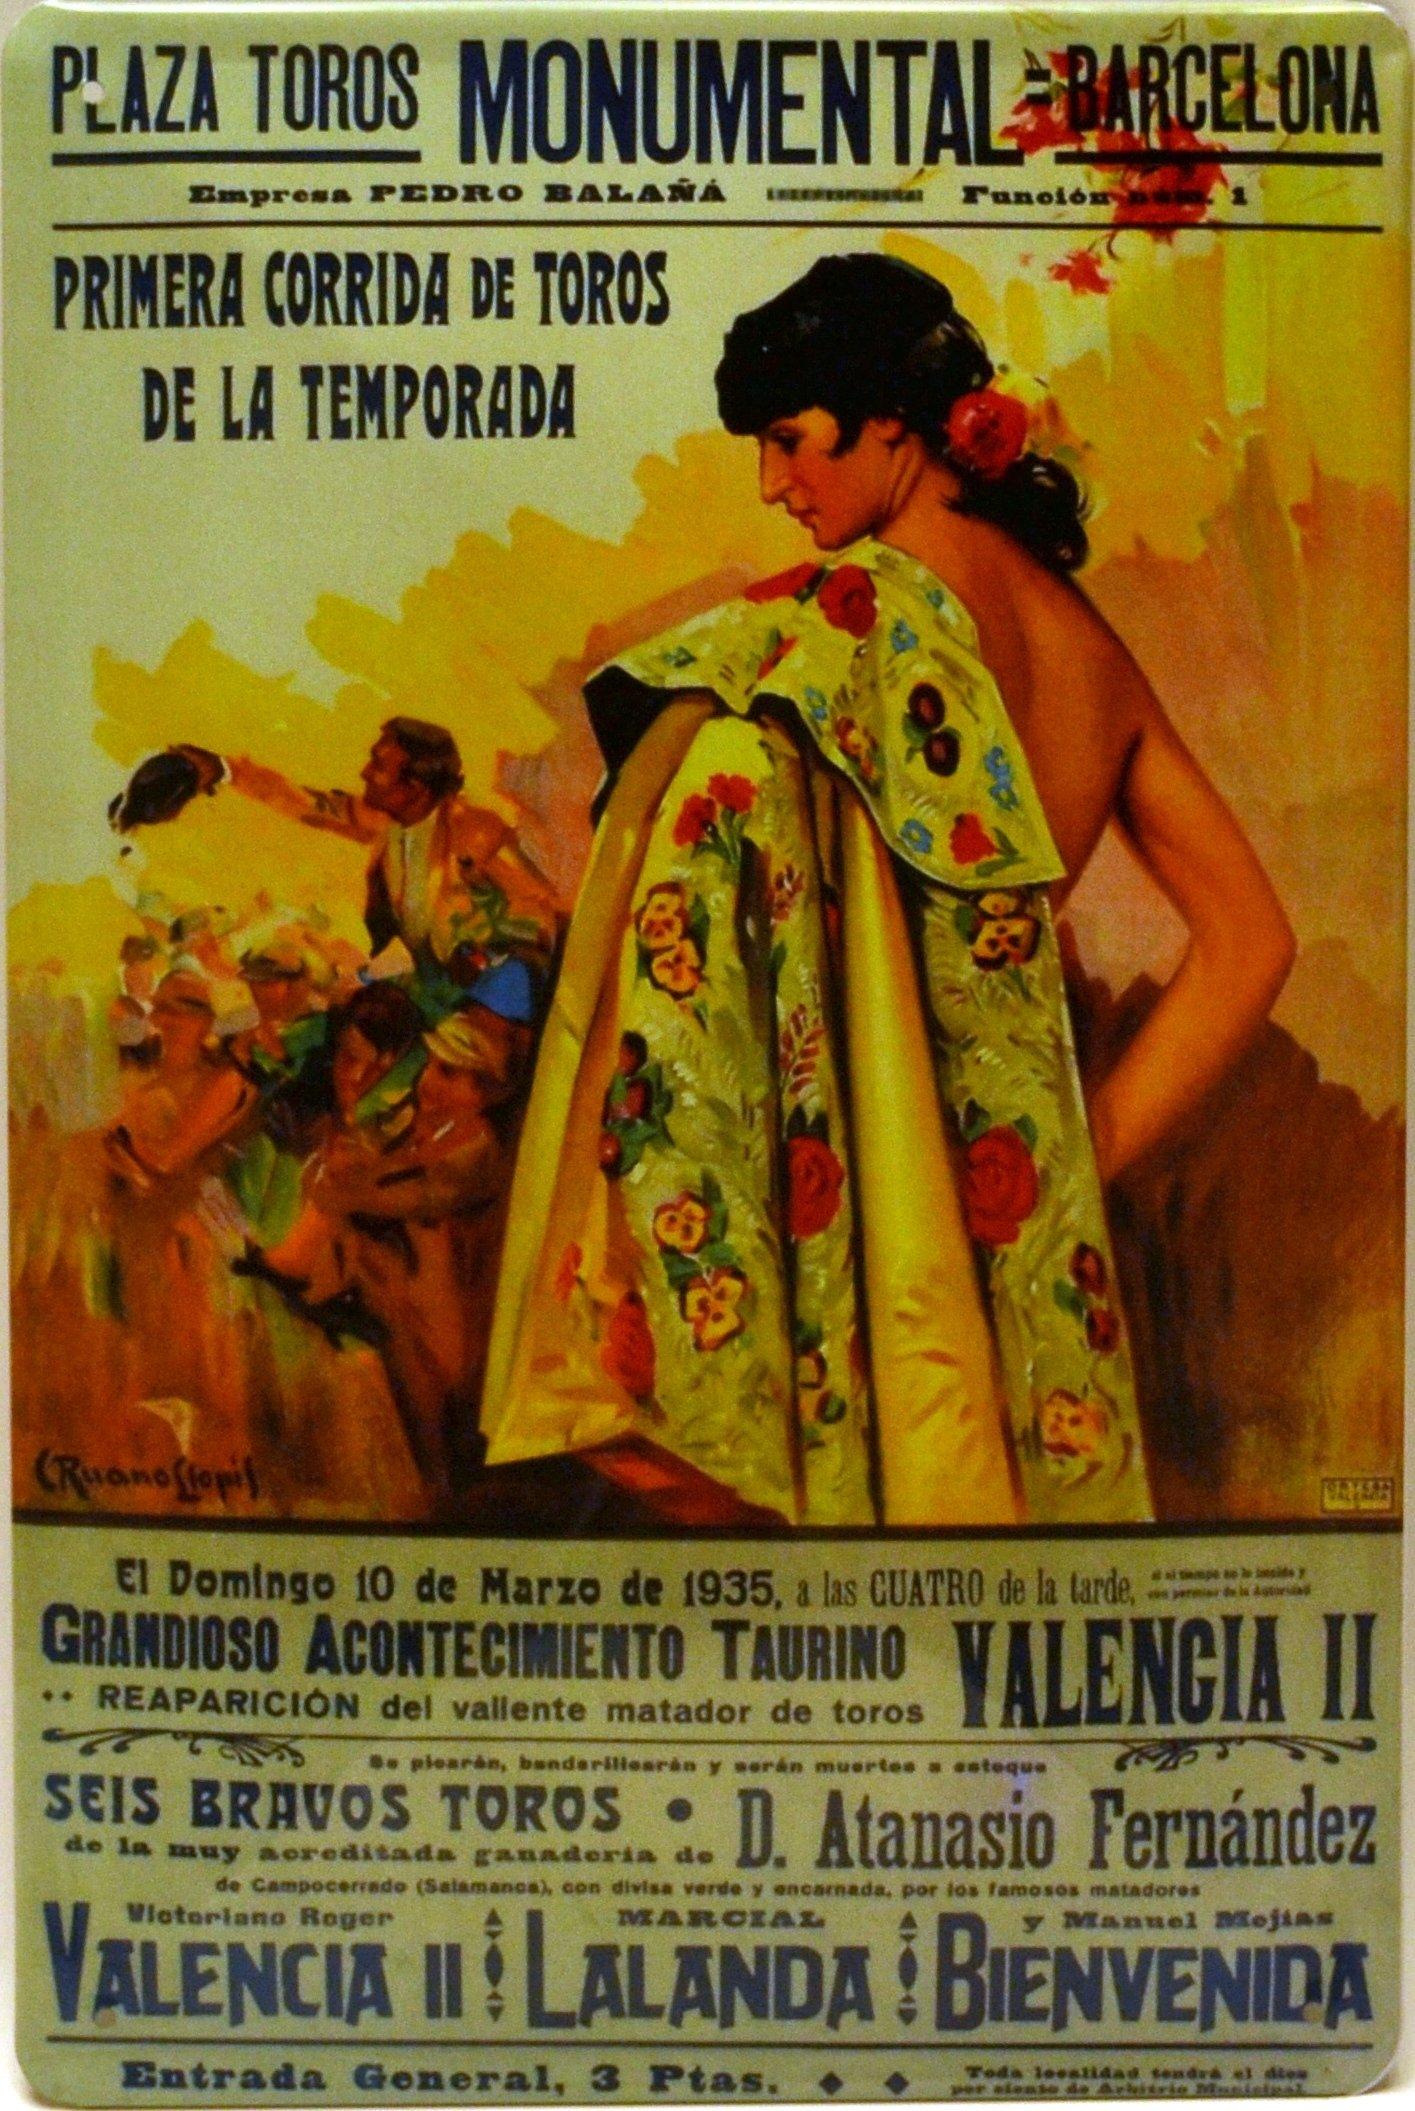 ART ESCUDELLERS Cartel Póster publicitario de Chapa metálica con diseño Retro Vintage de Catalunya/España. Tin Sign. 30 cm x 20 cm (Plaza DE TOROS Monumental Barcelona Capote): Amazon.es: Hogar